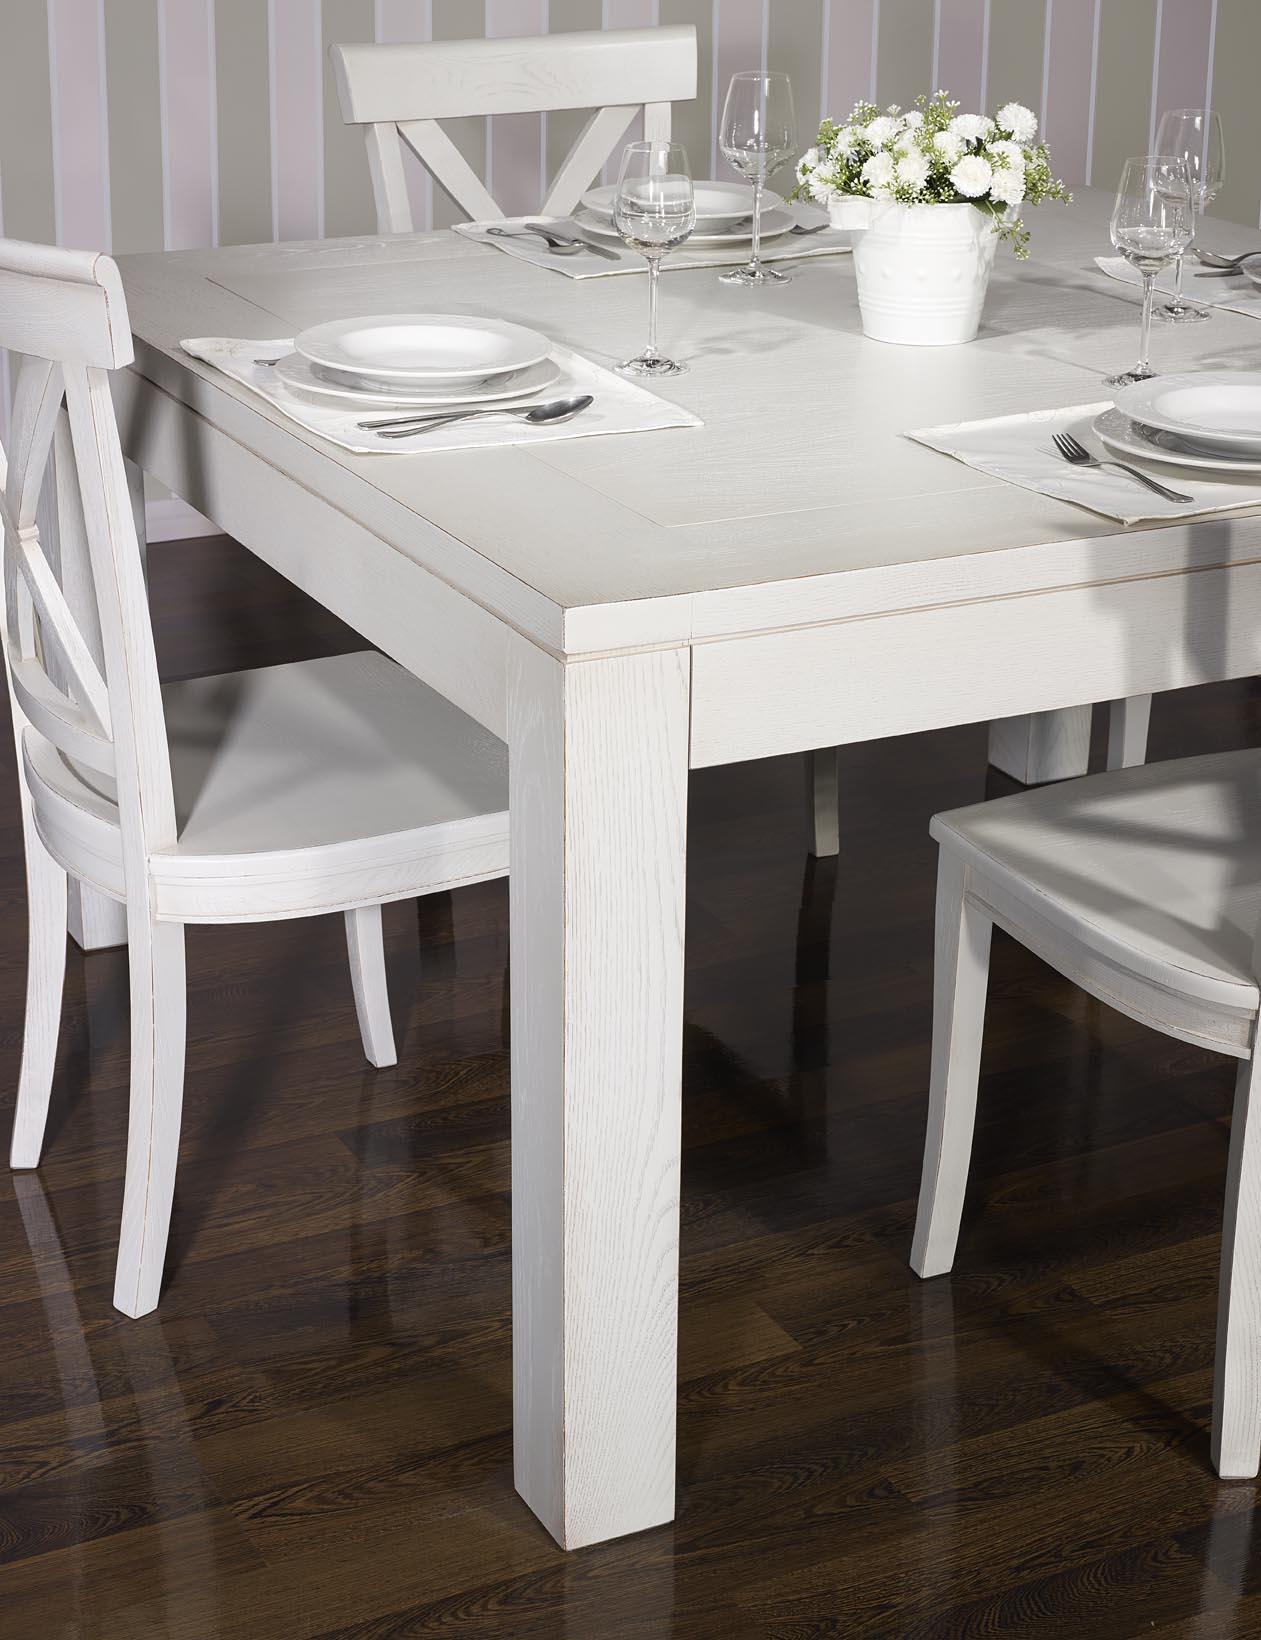 Table de salle manger 150 150 contemporaine en ch ne for Meuble de salle a manger en chene massif